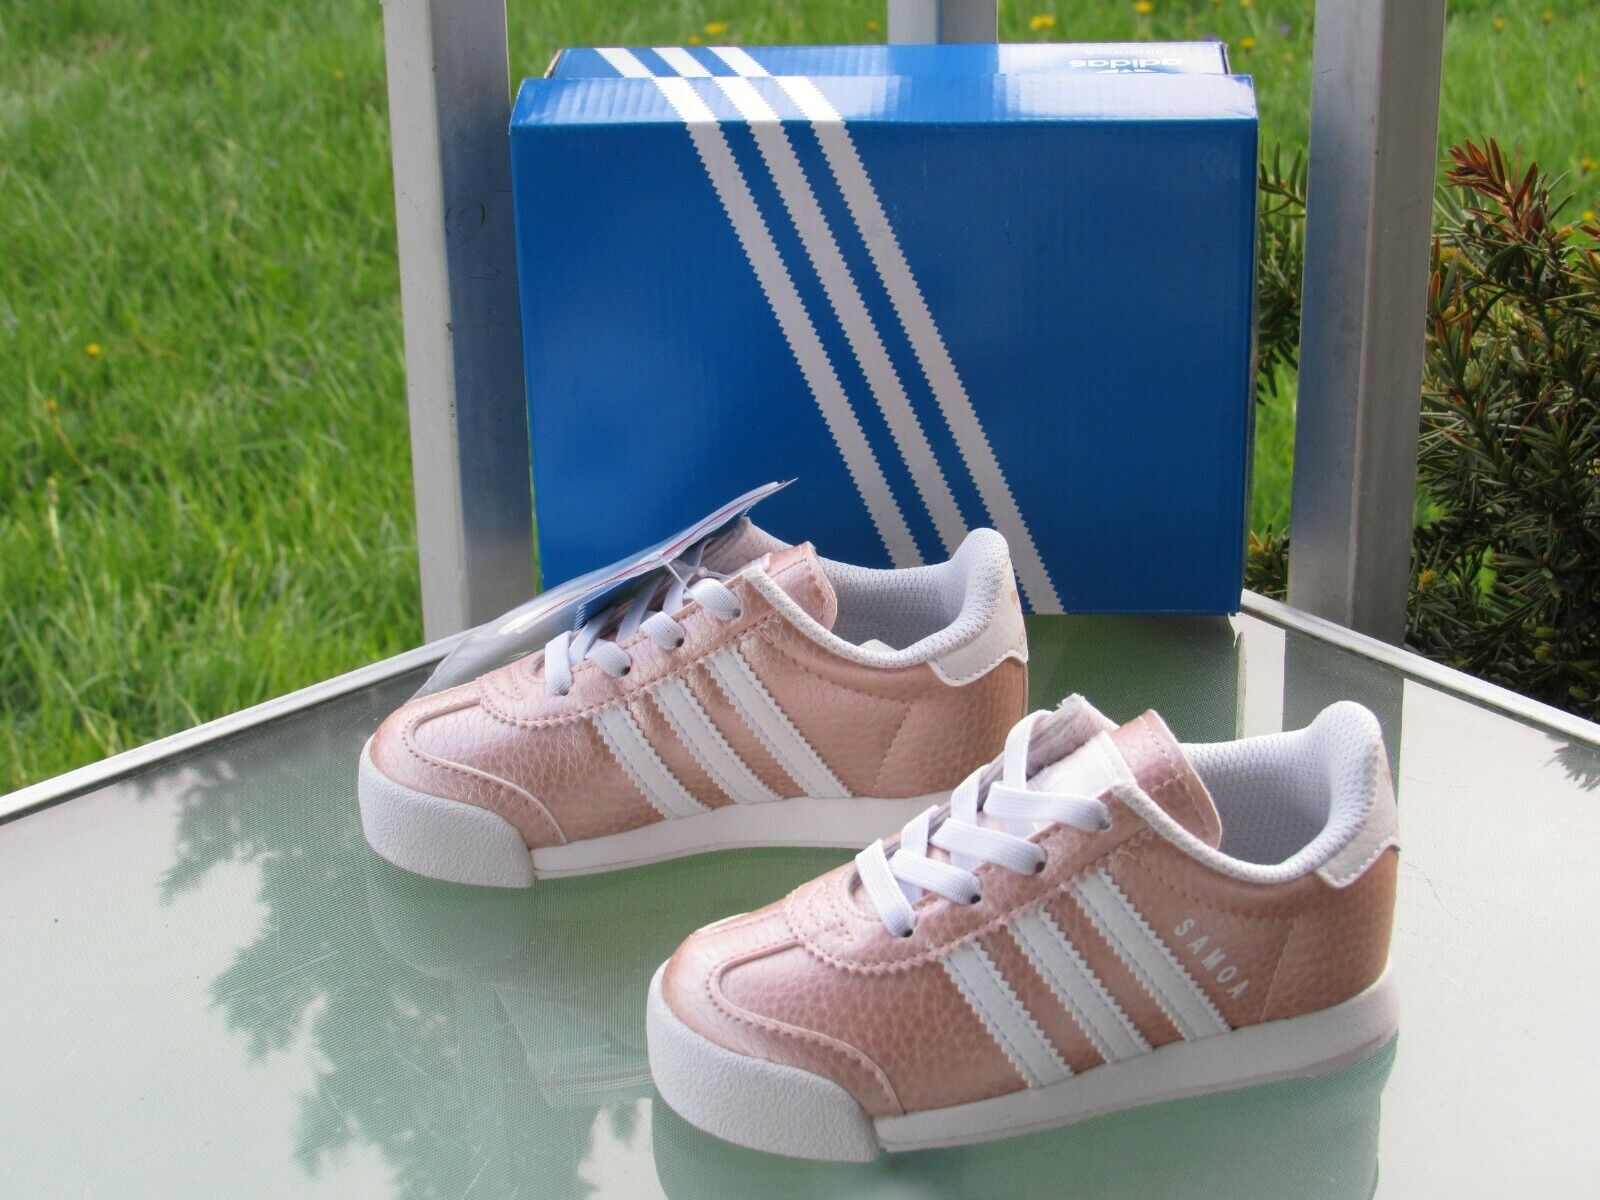 adidas Originals Samoa I Metallic Pink Ortholite Sneakers Little Girls size 7K